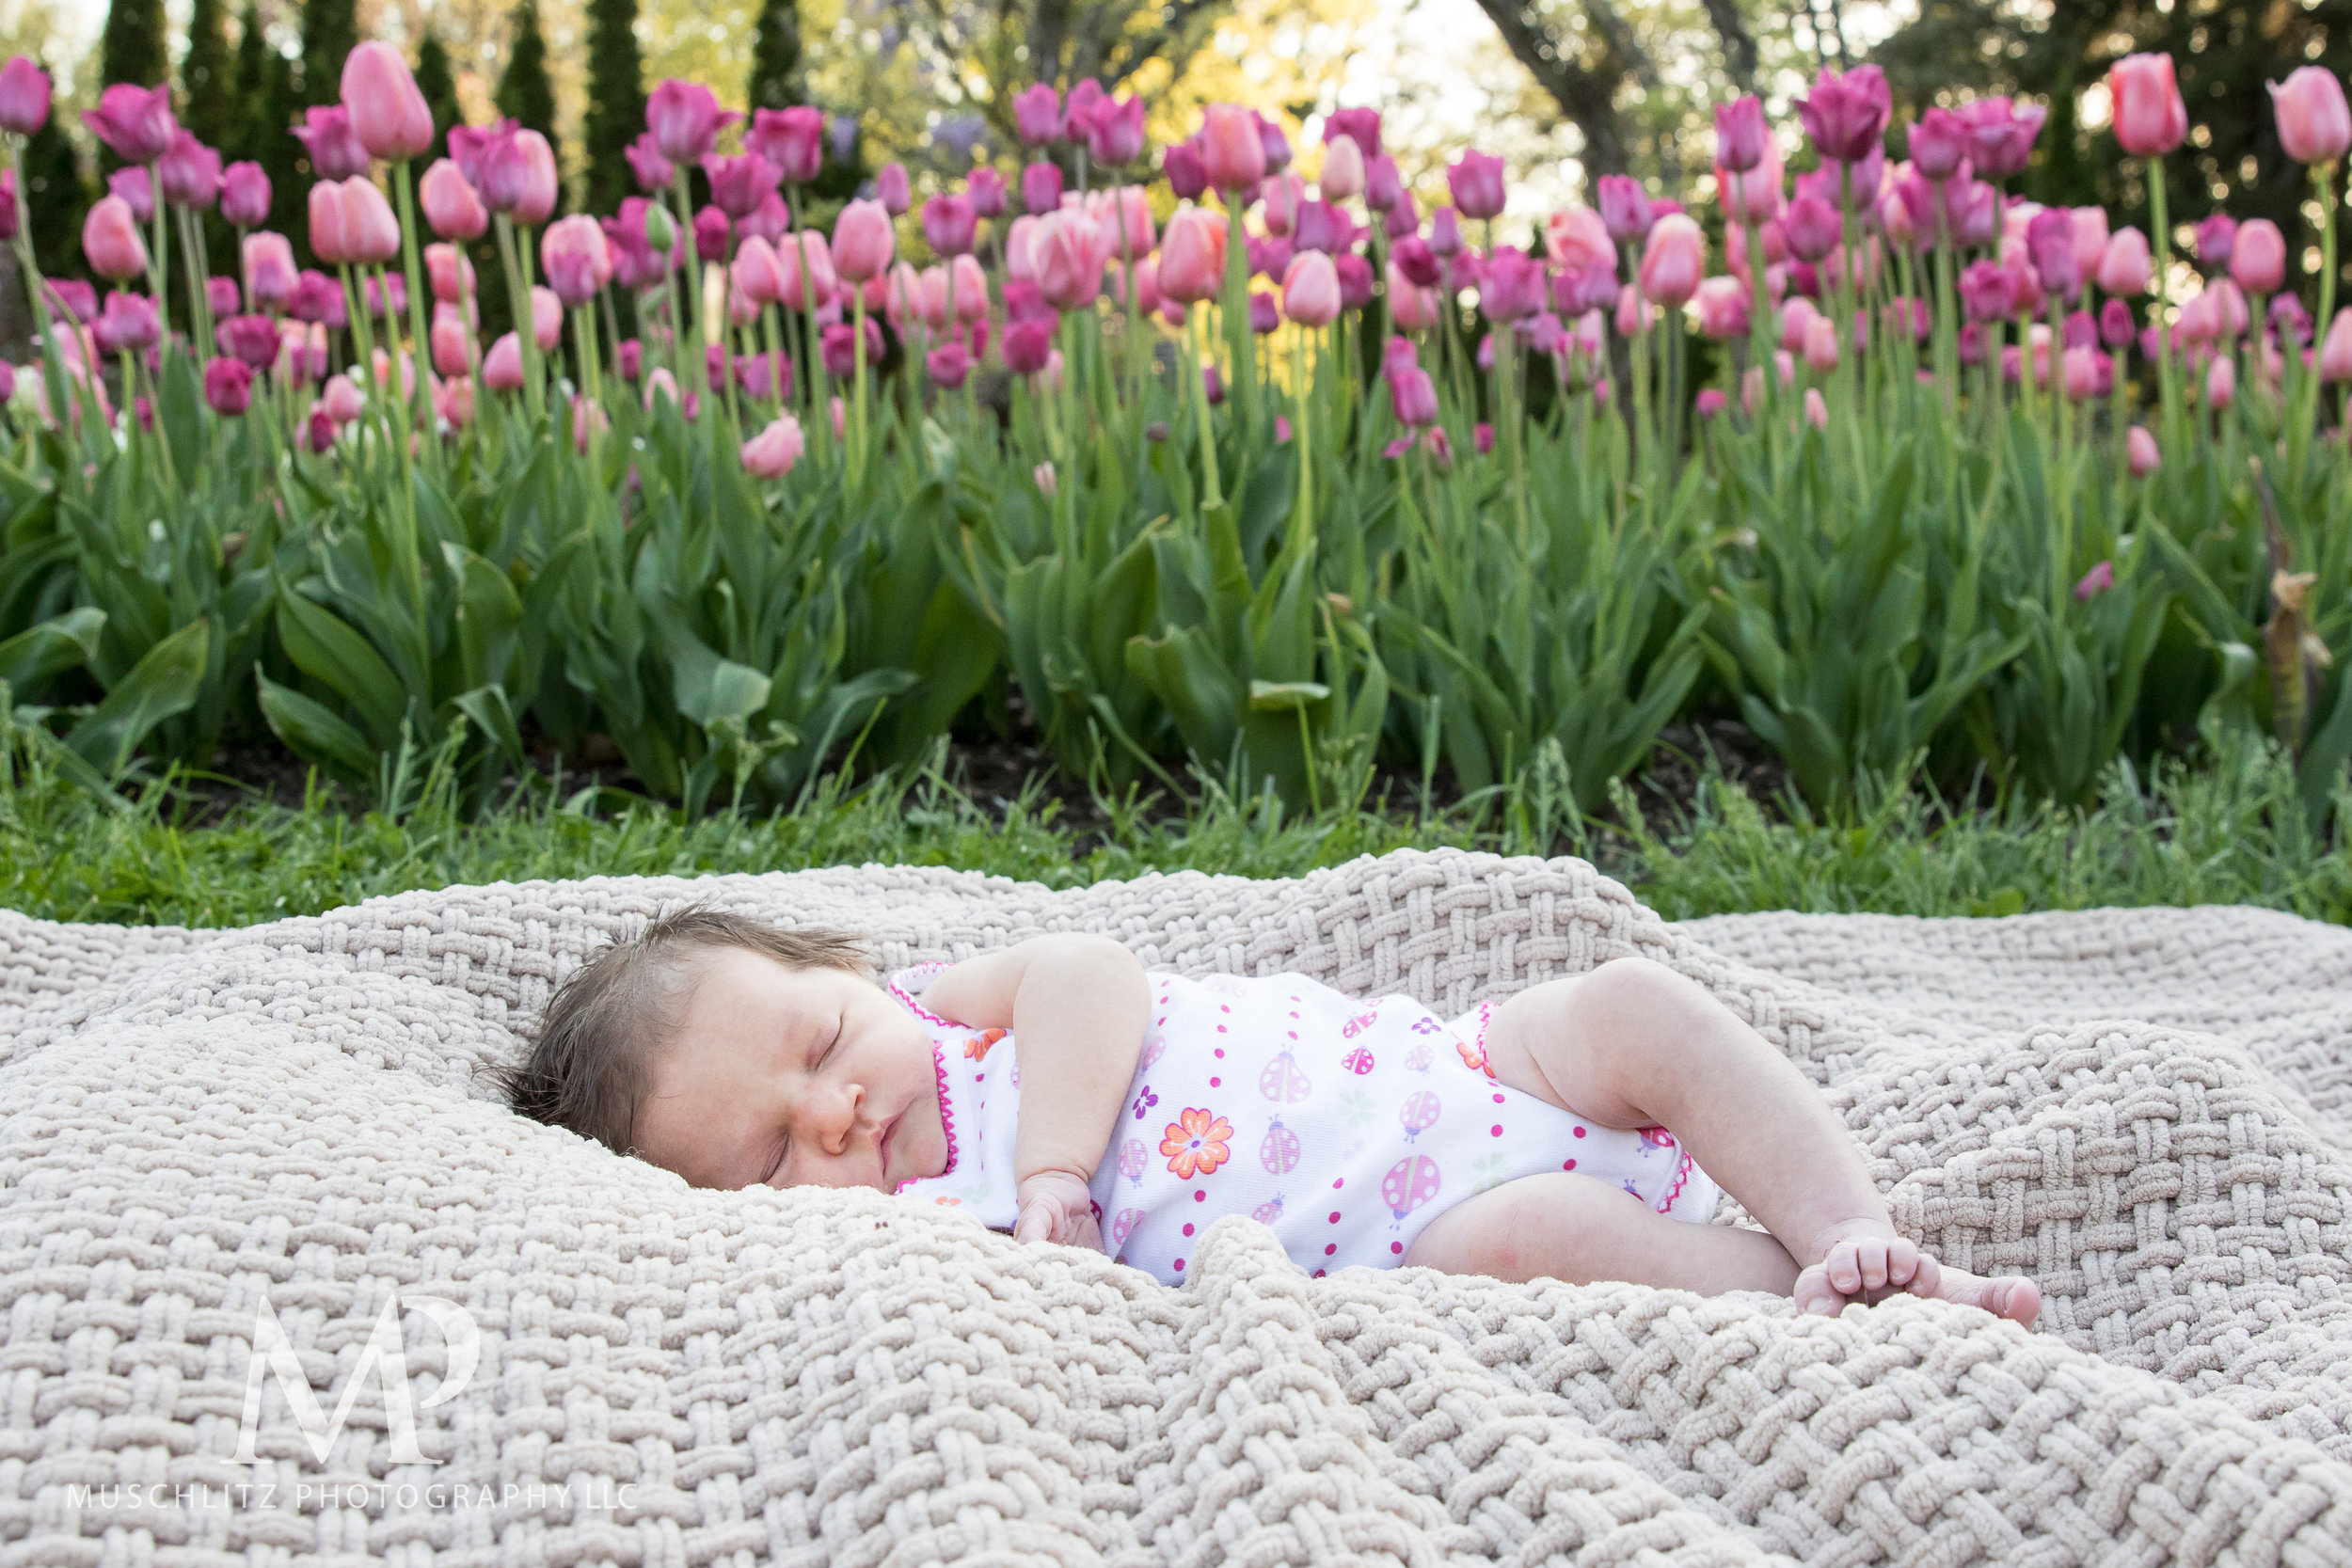 newborn-baby-family-portrait-session-spring-inniswood-metro-gardens-columbus-ohio-023.JPG